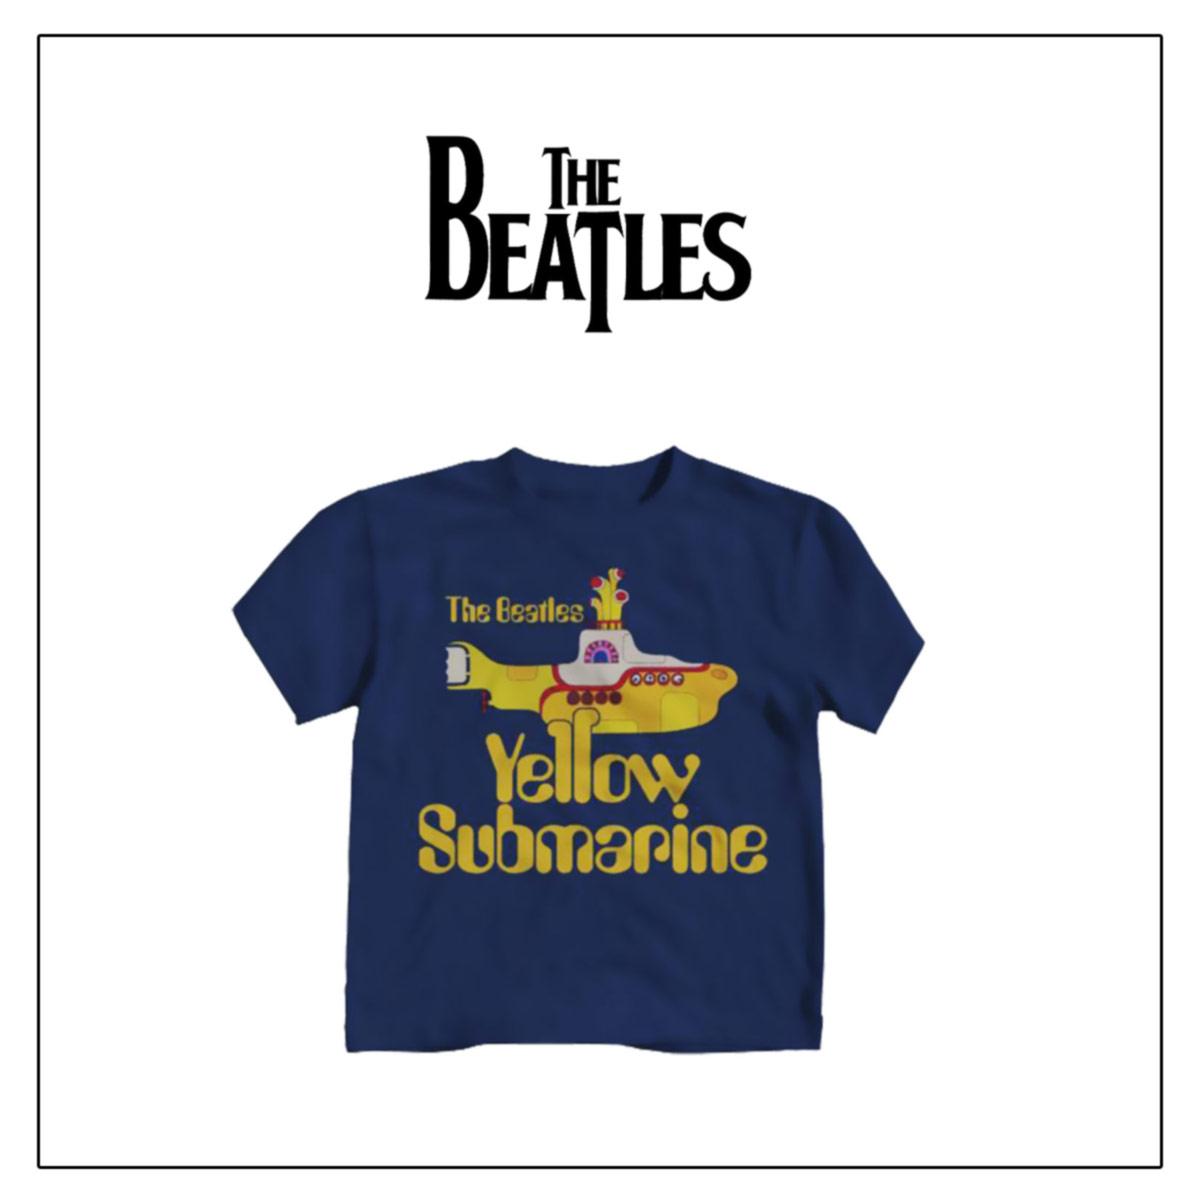 BEATLES,T-shirt Bambino 2-5 anni